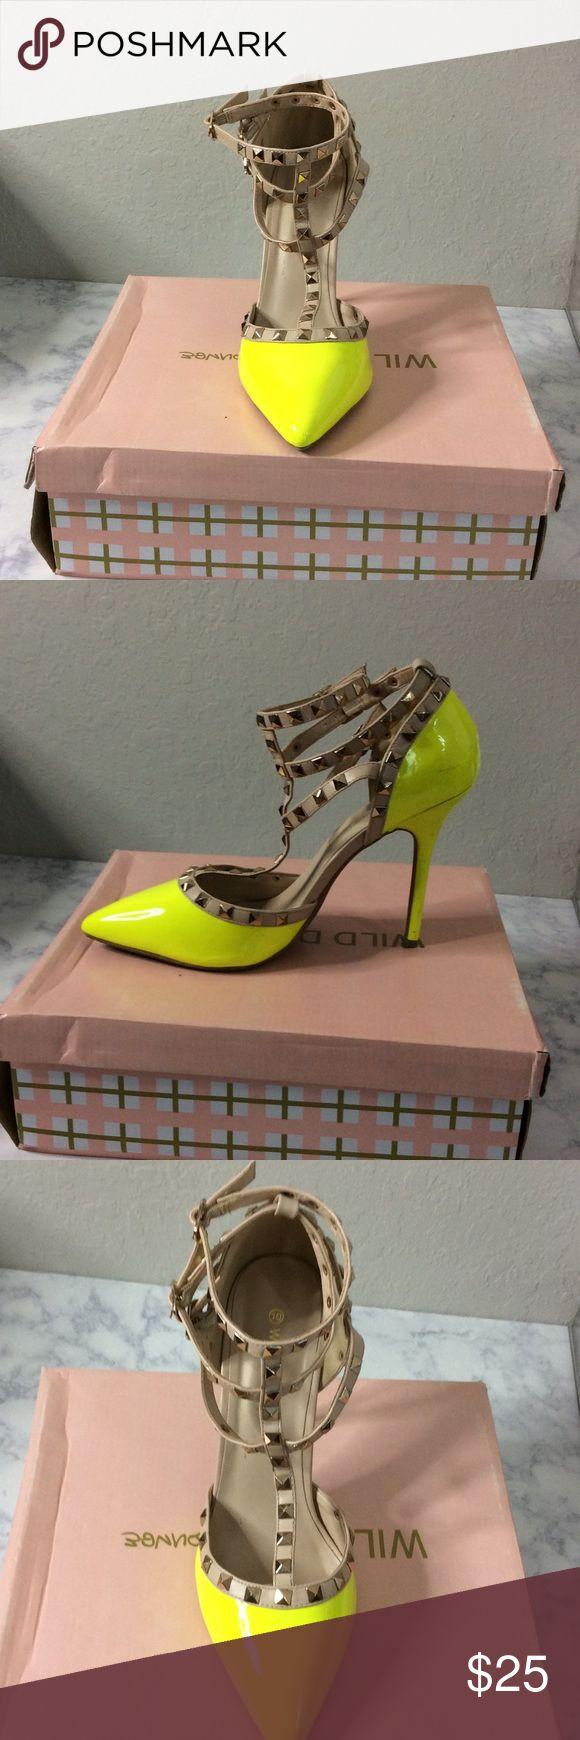 Hot Neon Yellow Pump! Beautiful and comfortable pump. Worn twice! Wild Diva Shoes Heels